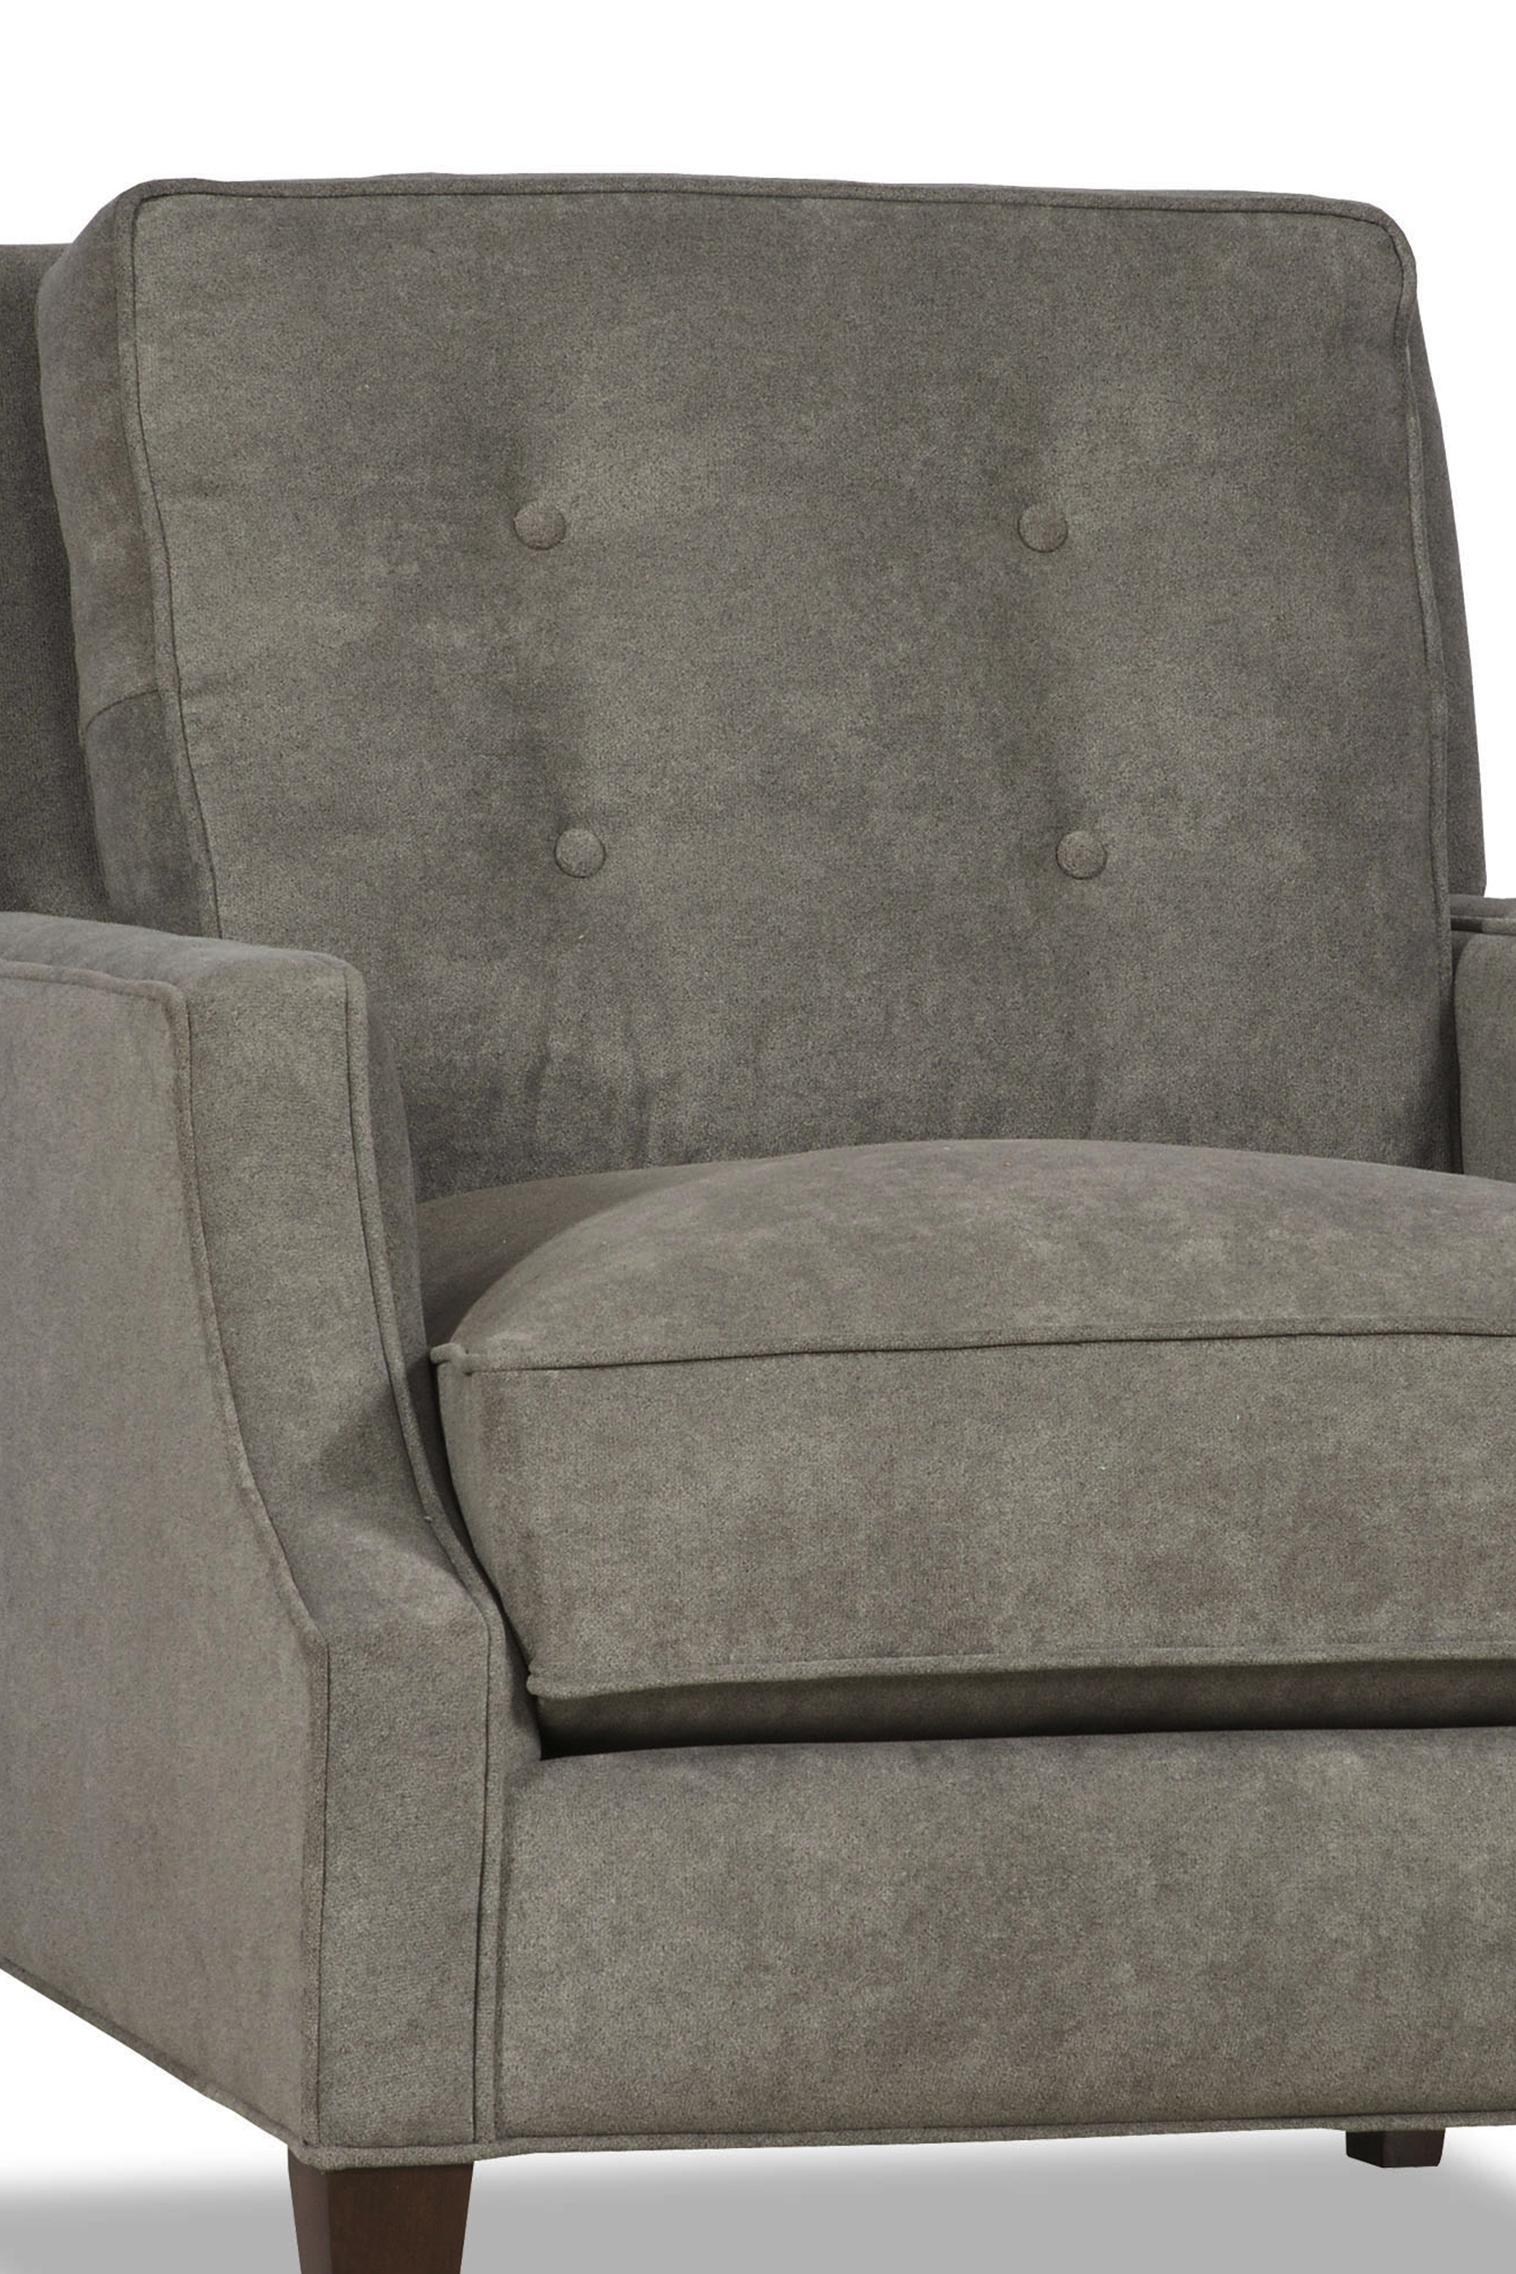 Palisade 7039 By Sam Moore Belfort Furniture Sam Moore Palisade Dealer